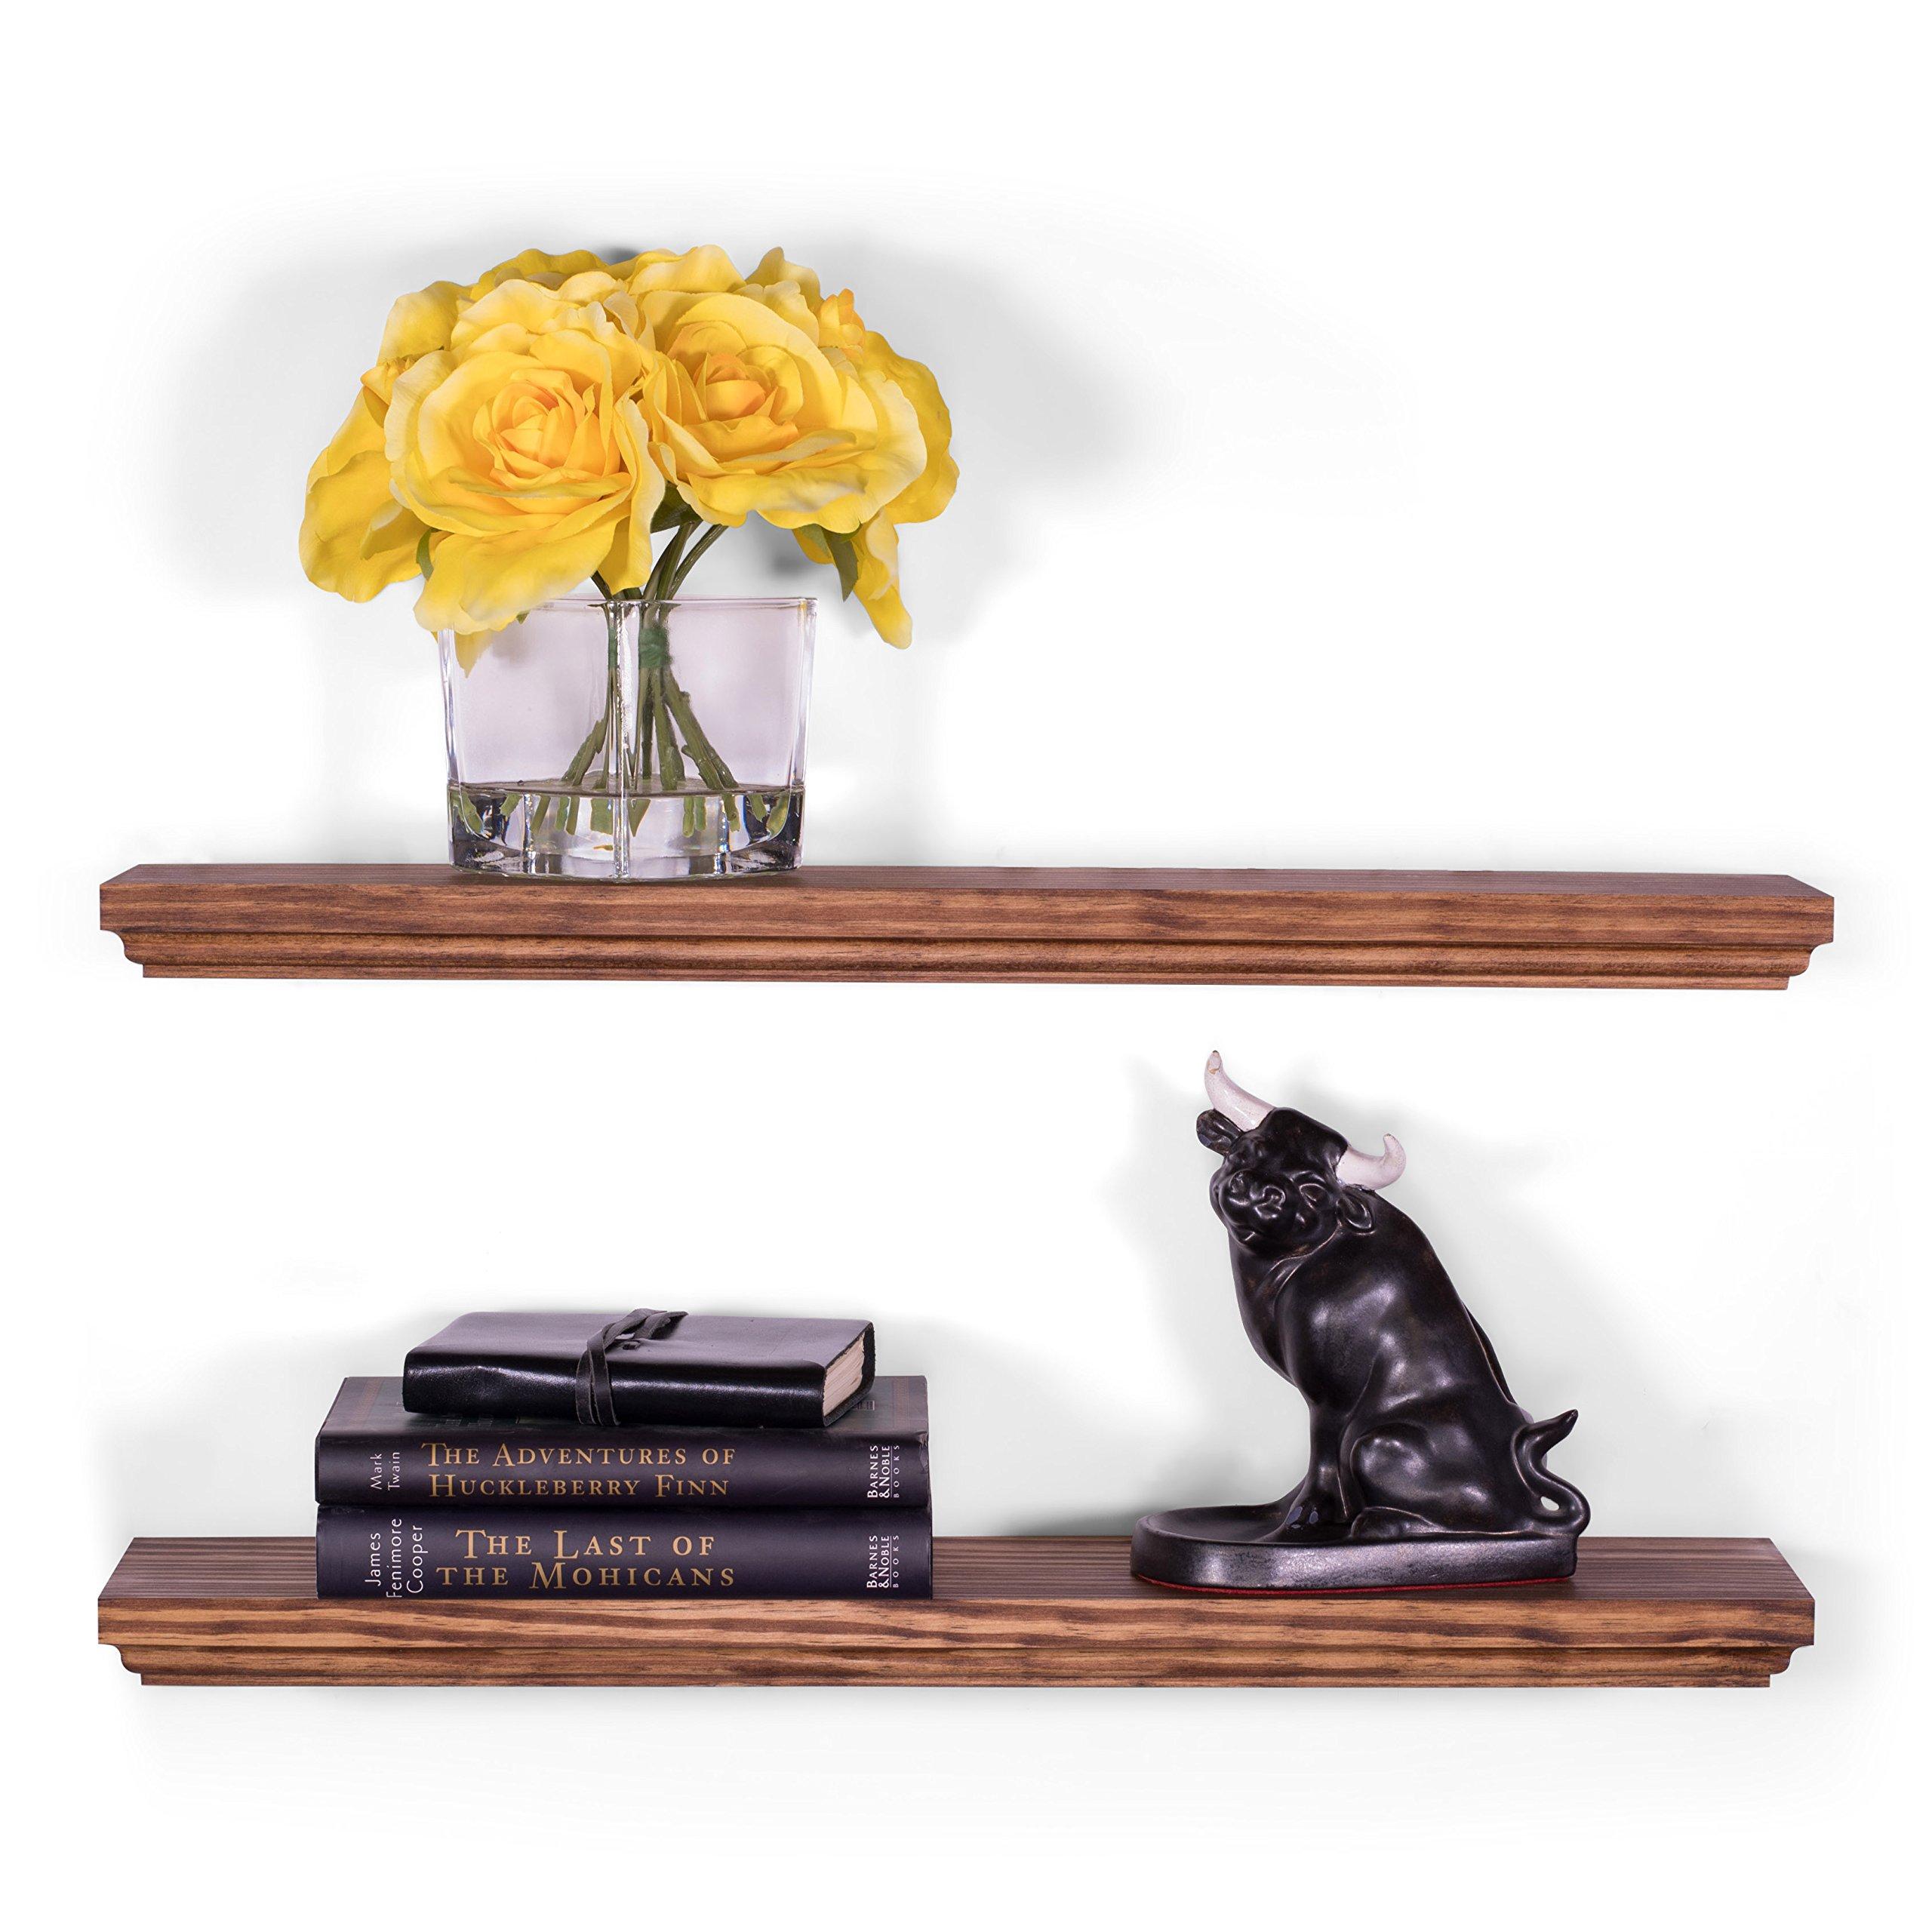 DAKODA LOVE 5.25'' Deep Routed Edge Floating Shelves, USA Handmade, Clear Coat Finish, 100% Countersunk Hidden Floating Shelf Brackets, Beautiful Grain Pine Wood Wall Decor (Set of 2) (24'', Bourbon)